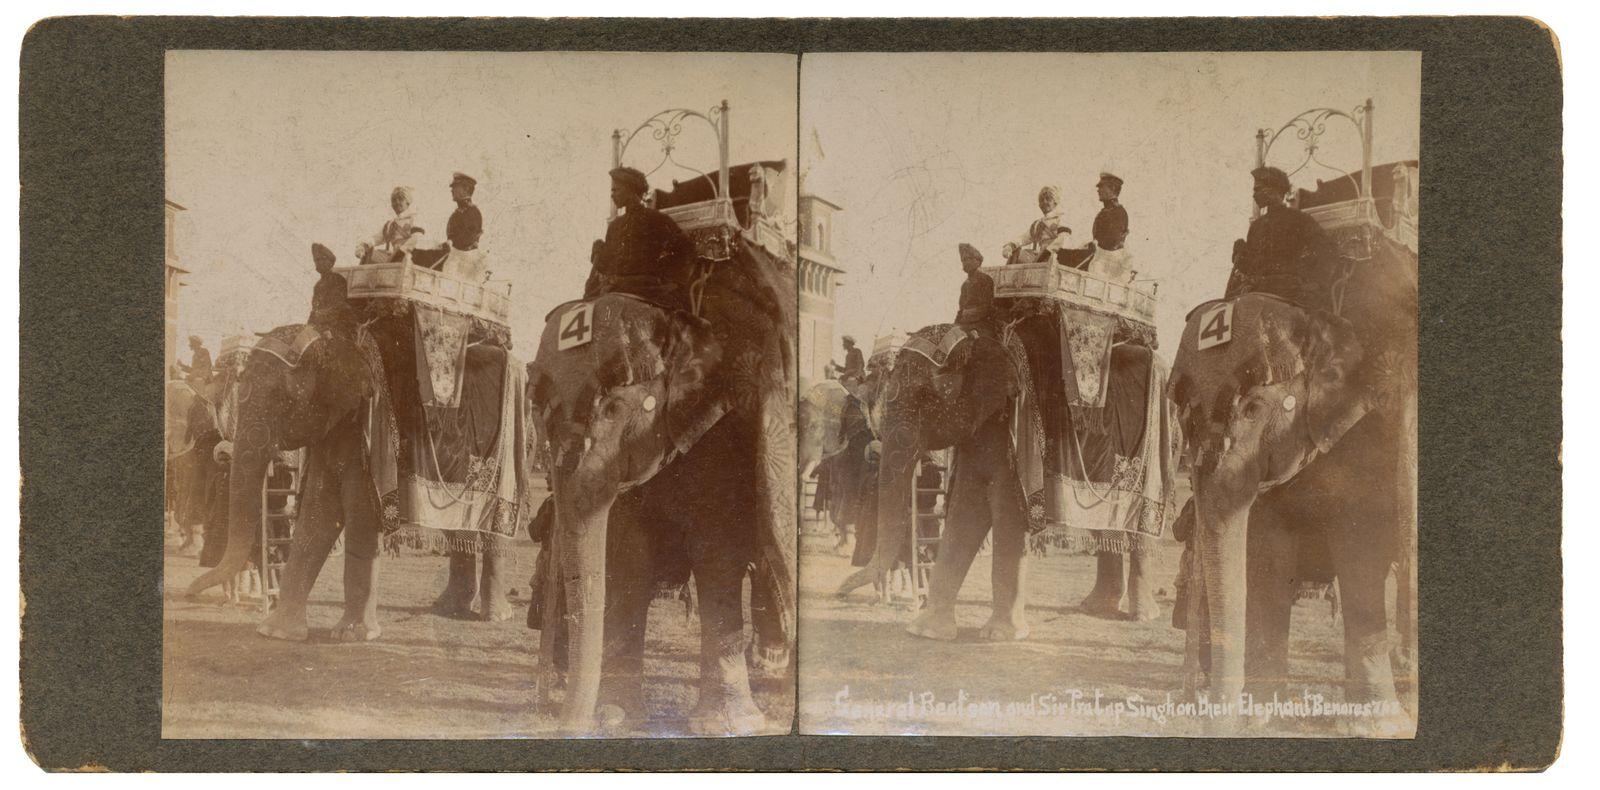 General Beatsan and sir Pratap Singh on their Elephant Beneres